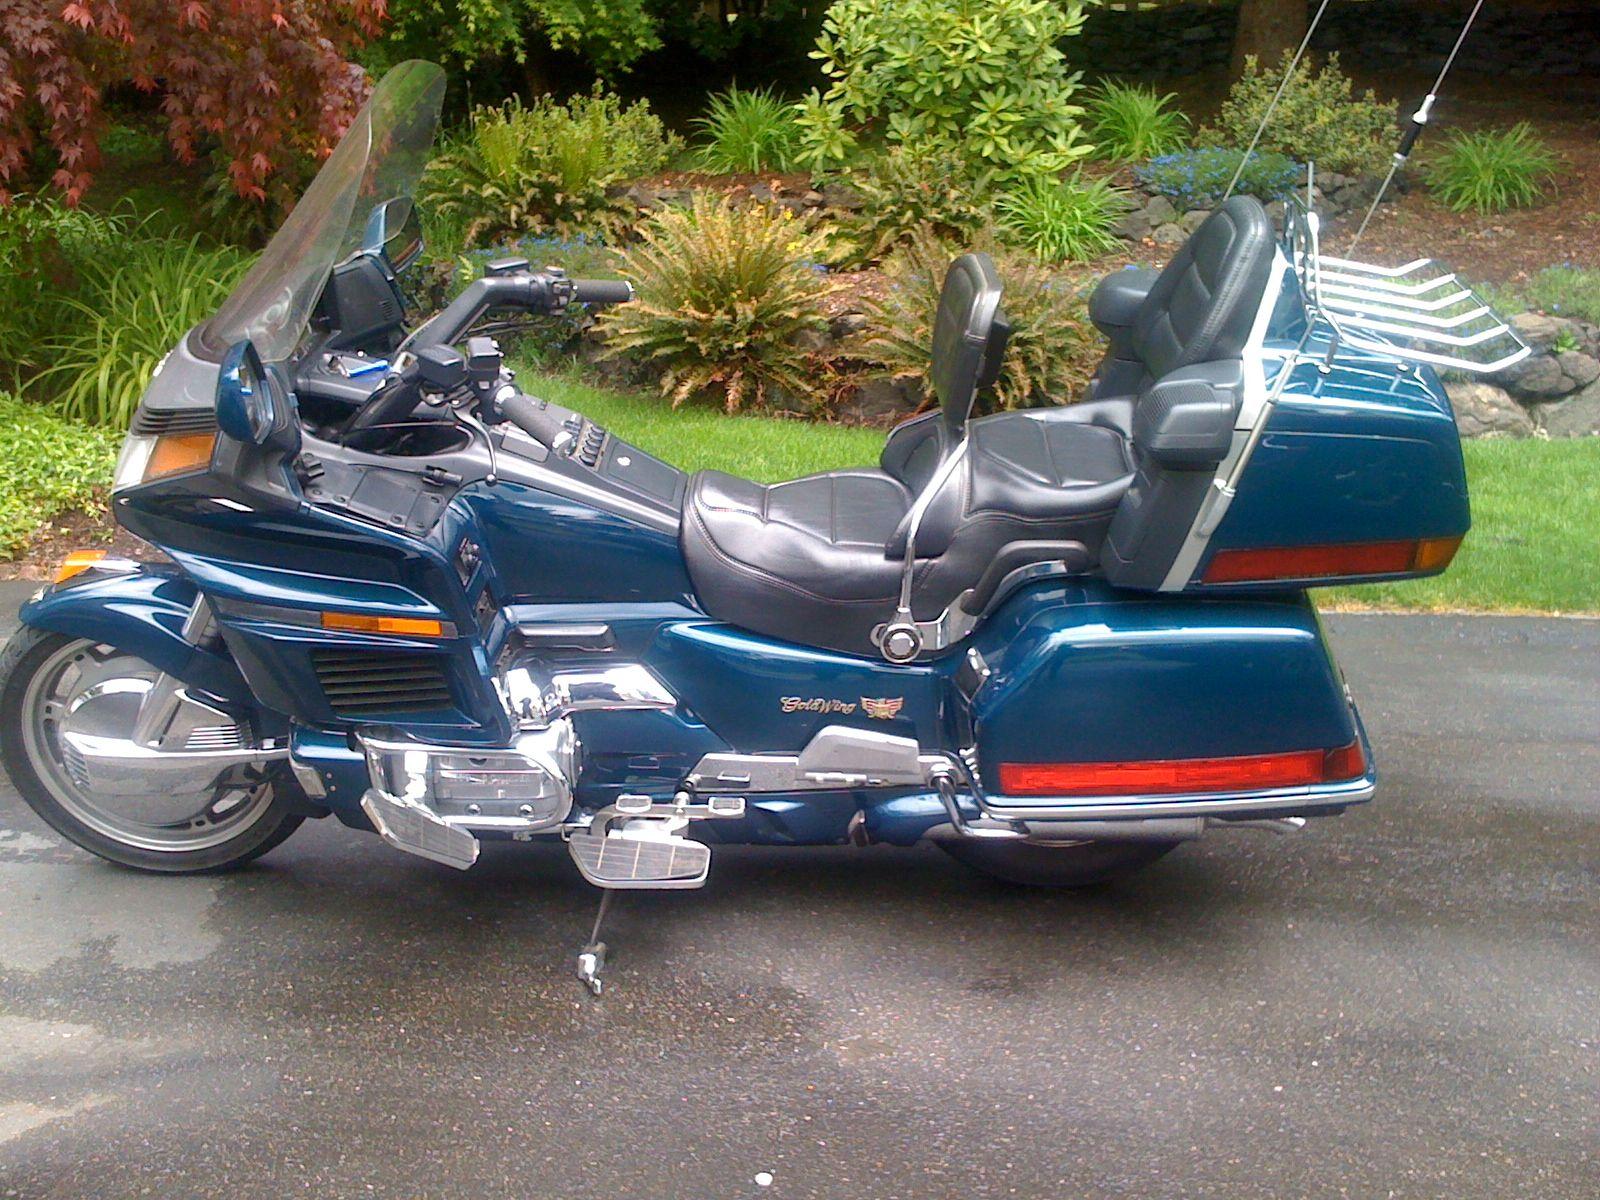 1994 Honda Goldwing Gl1500 Vintage Honda Motorcycles Touring Motorcycles Touring Bike